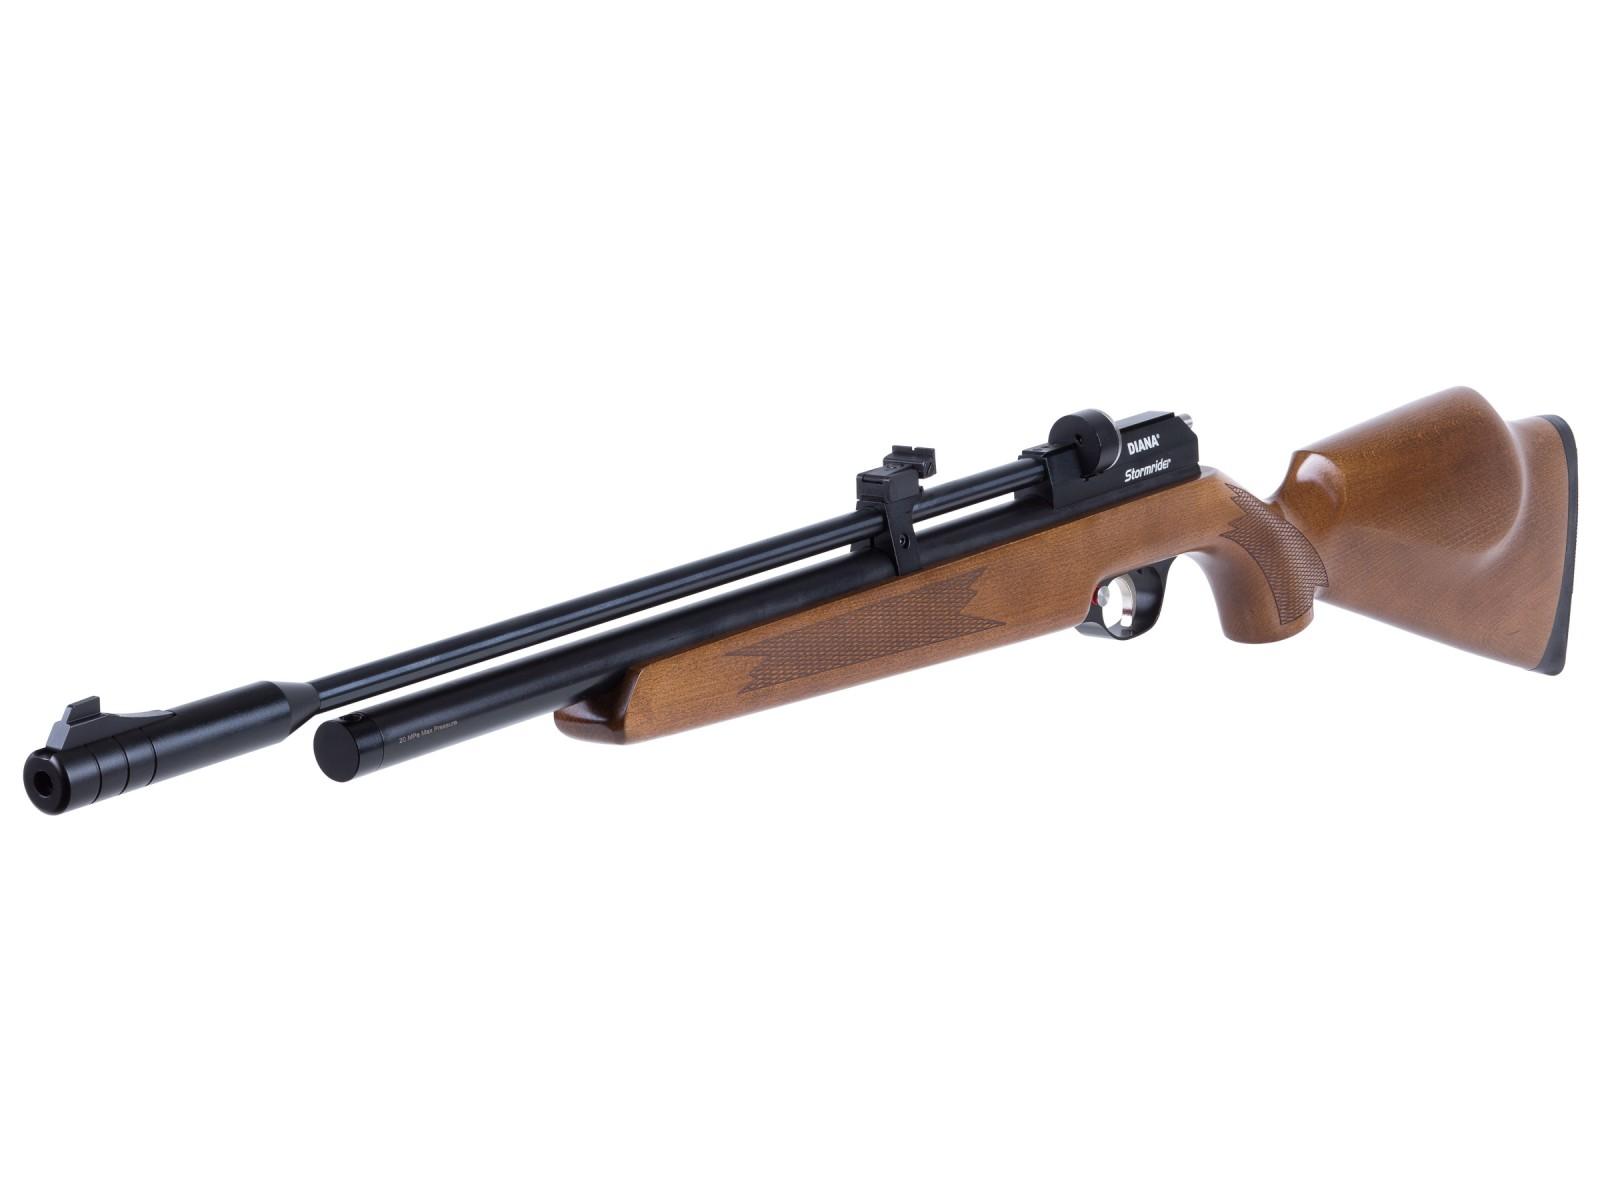 Diana Stormrider Multi-shot PCP Air Rifle 0.22 Image